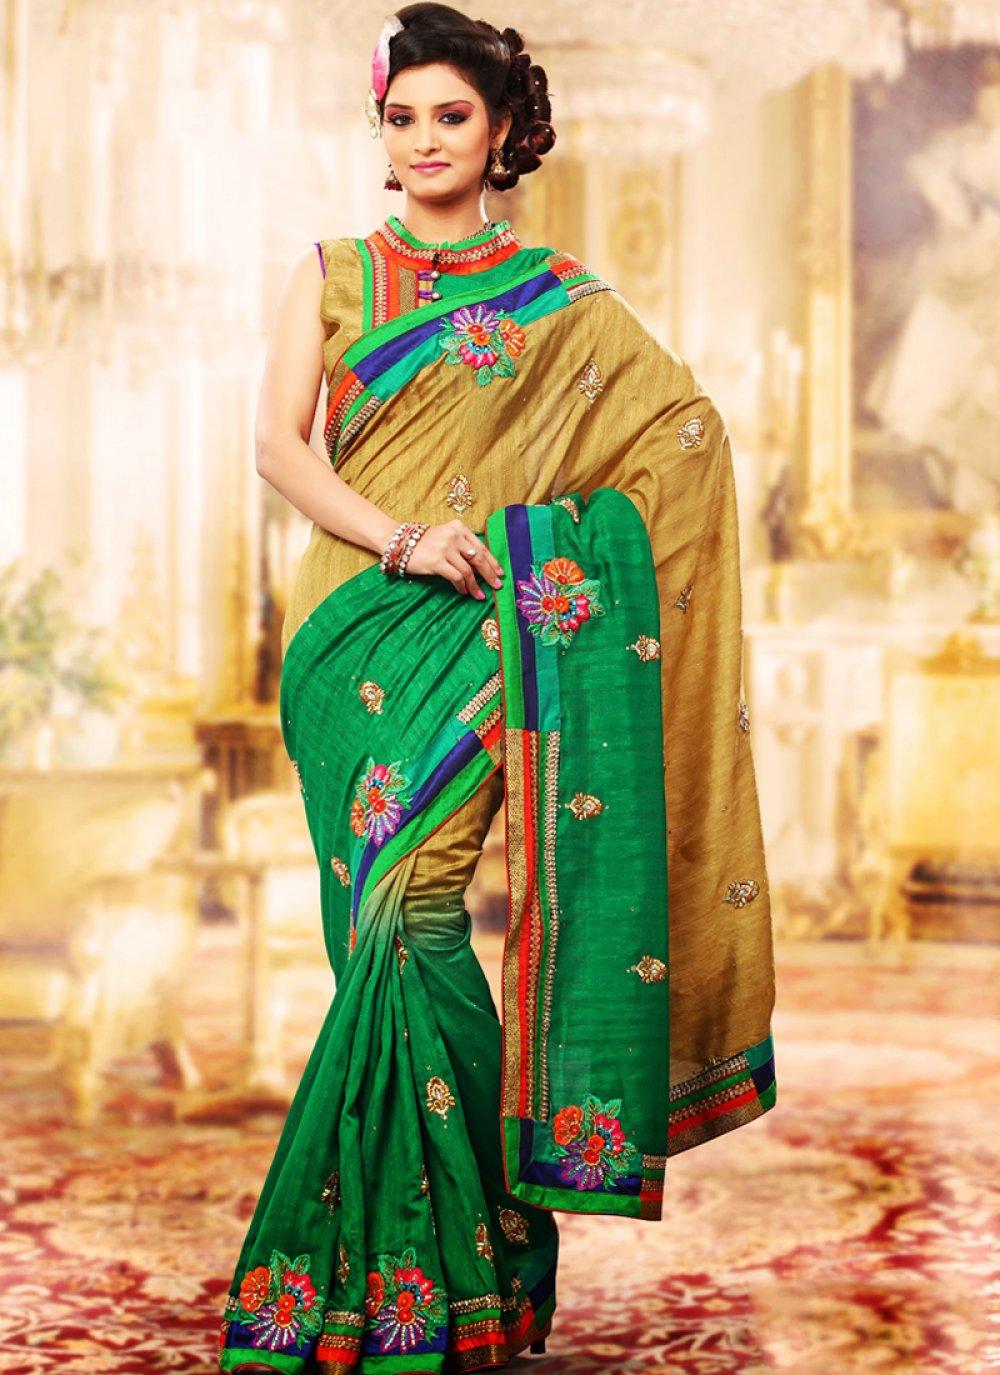 Enigmatic Apricot & Emerald Green Embroidered Saree